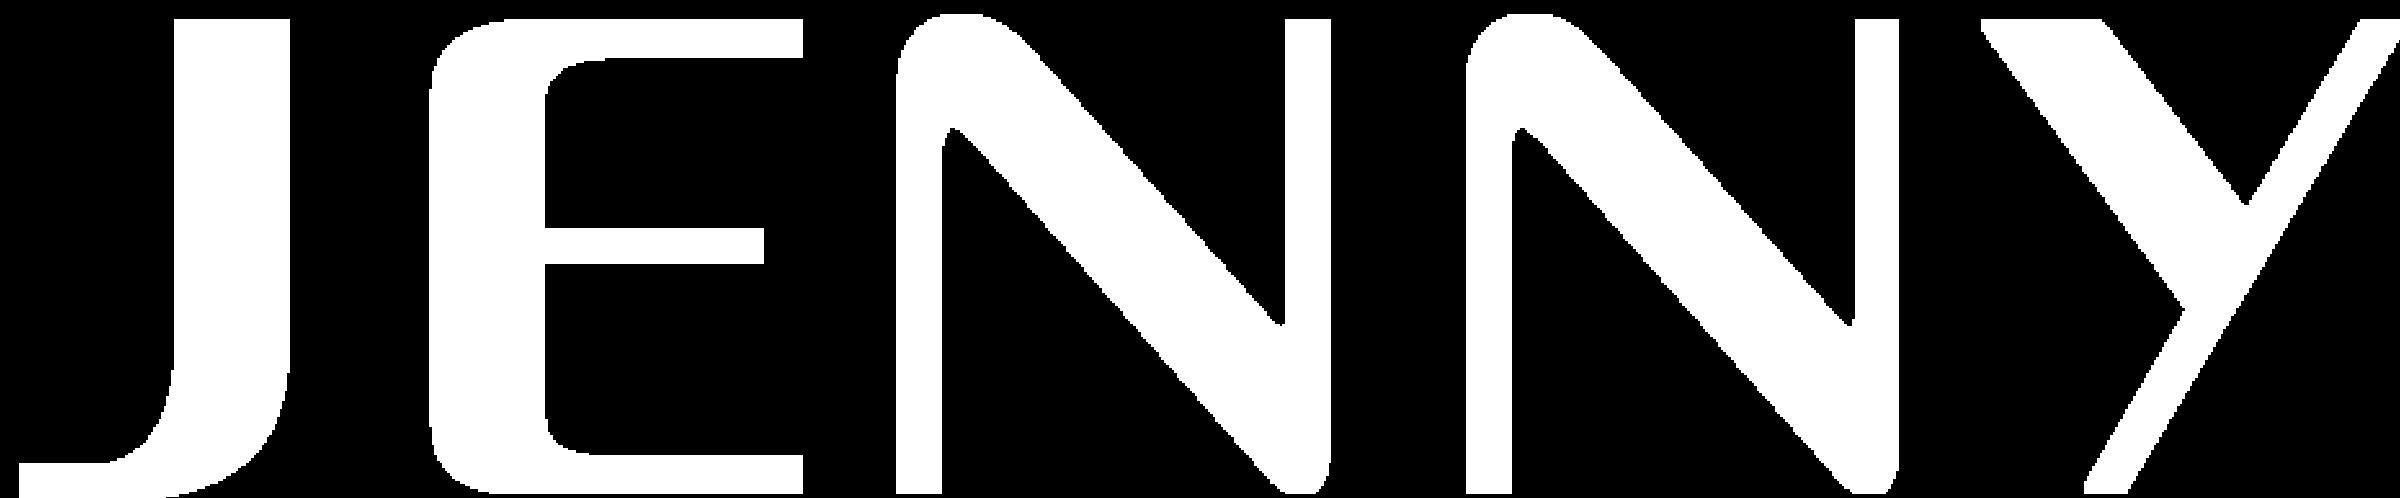 Jenny Logo